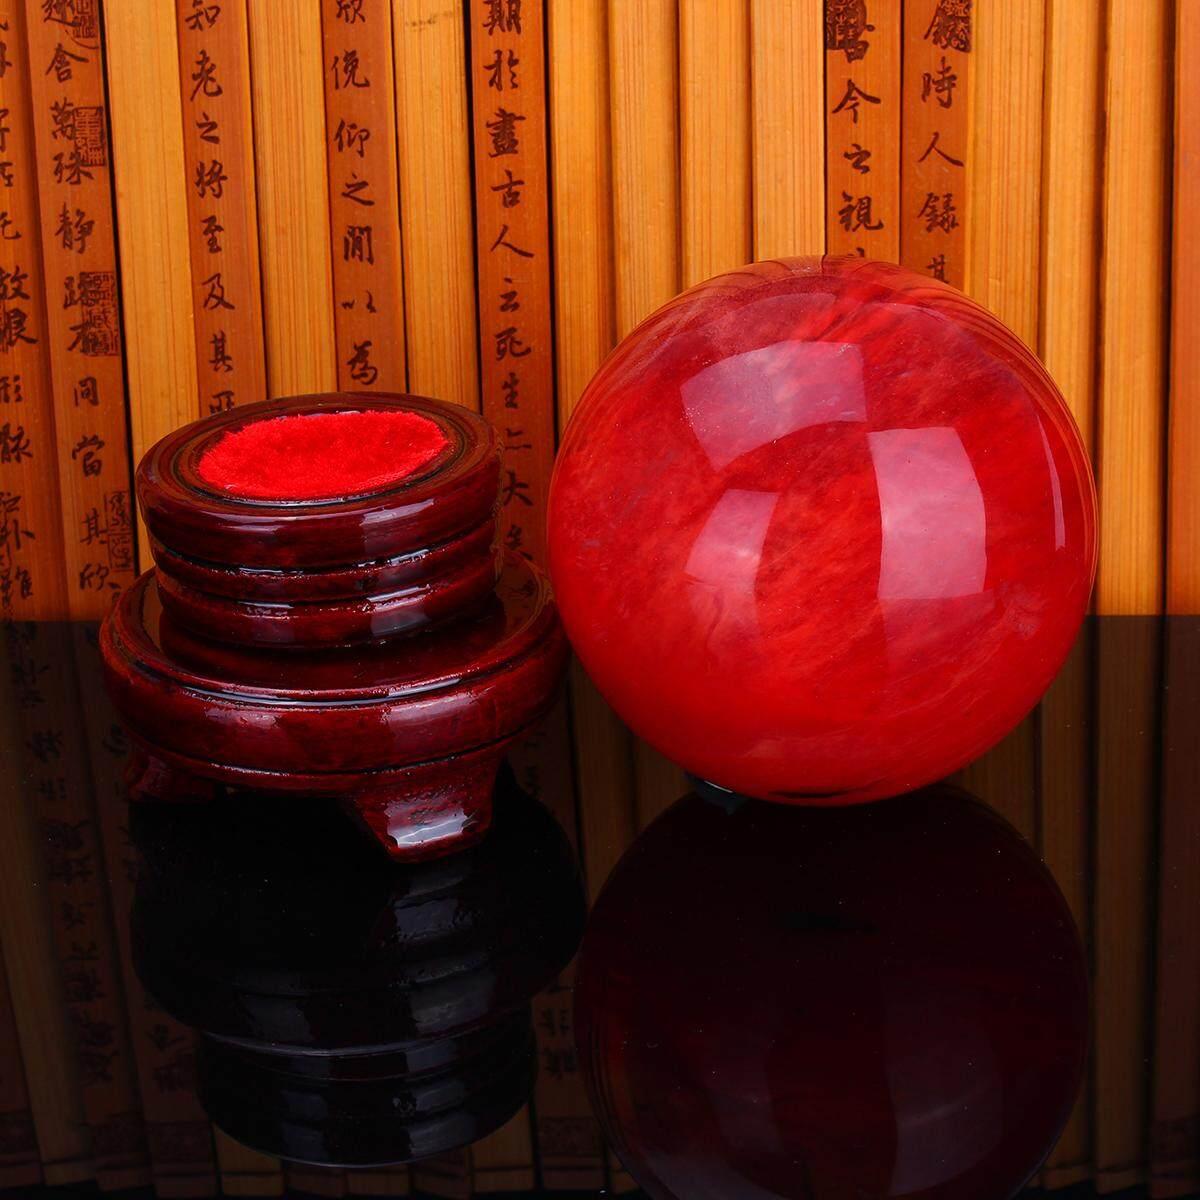 (photo)Red Crystal Ball Citrine Calcite Quartz Sphere Healing Gemstone Car Brand New